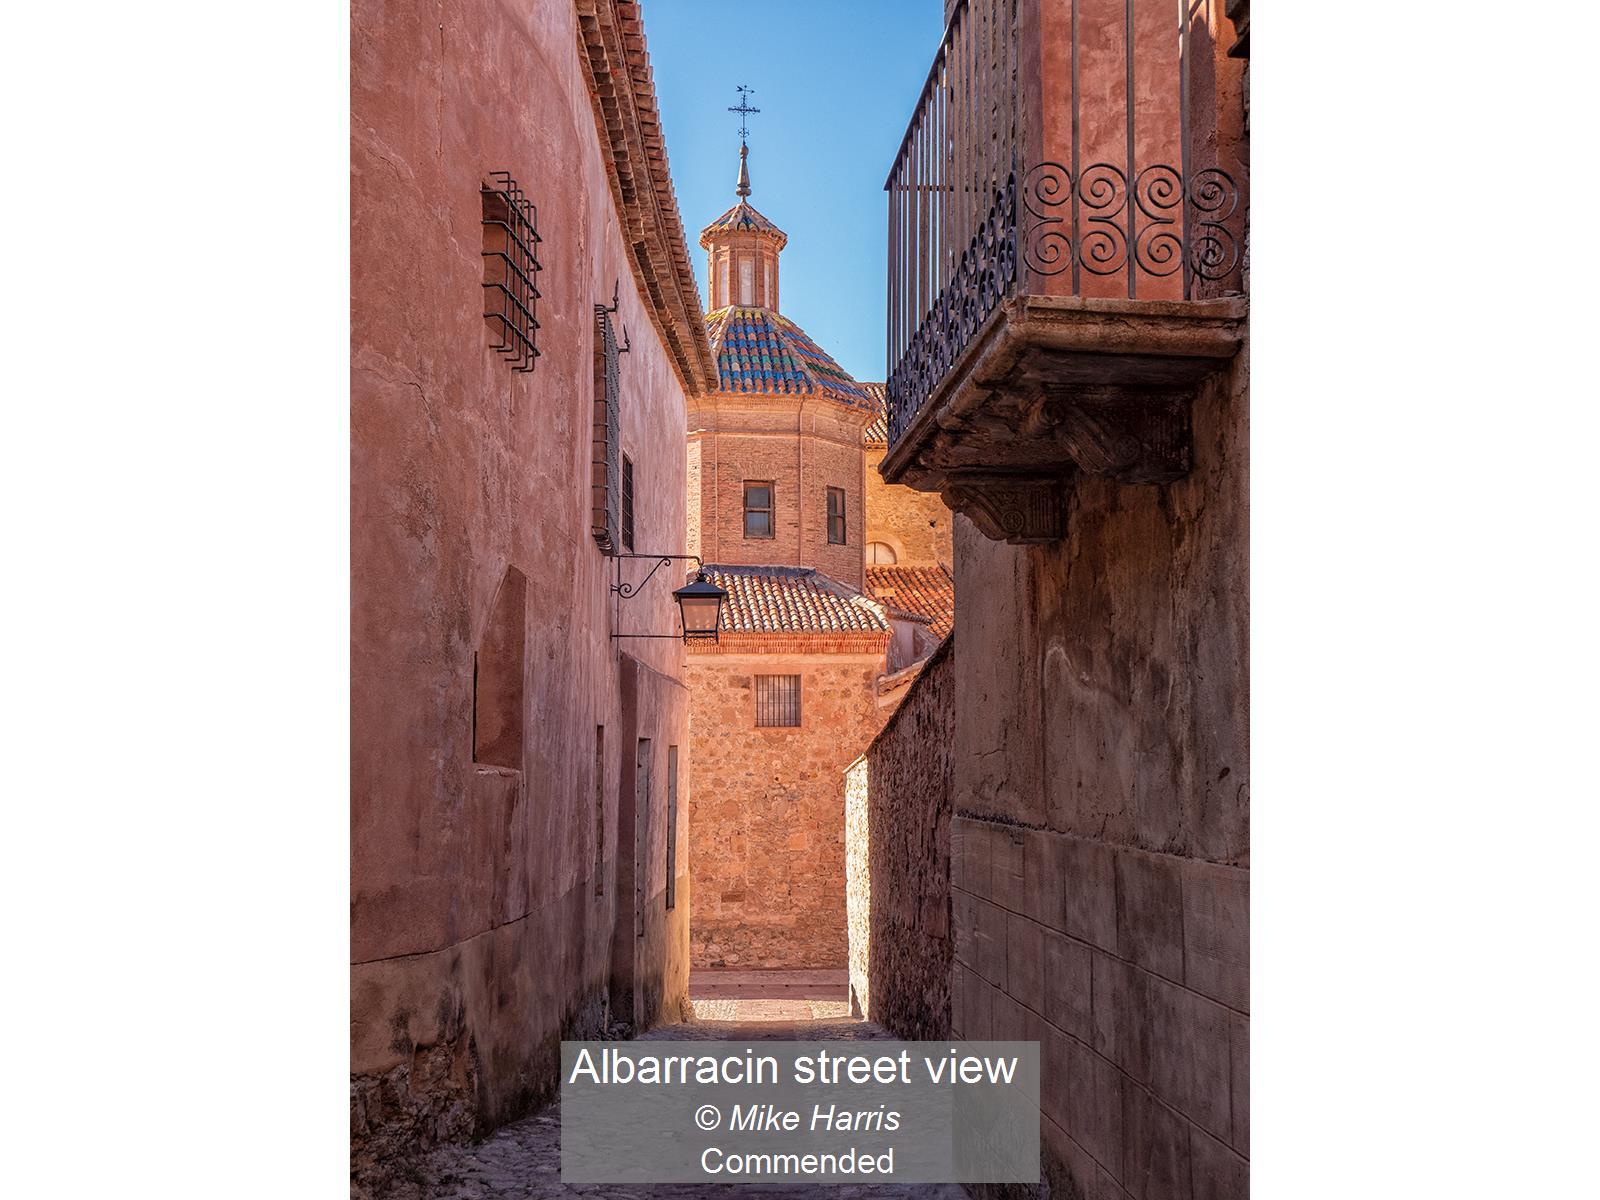 Albarracin street view_Mike Harris_Comm.